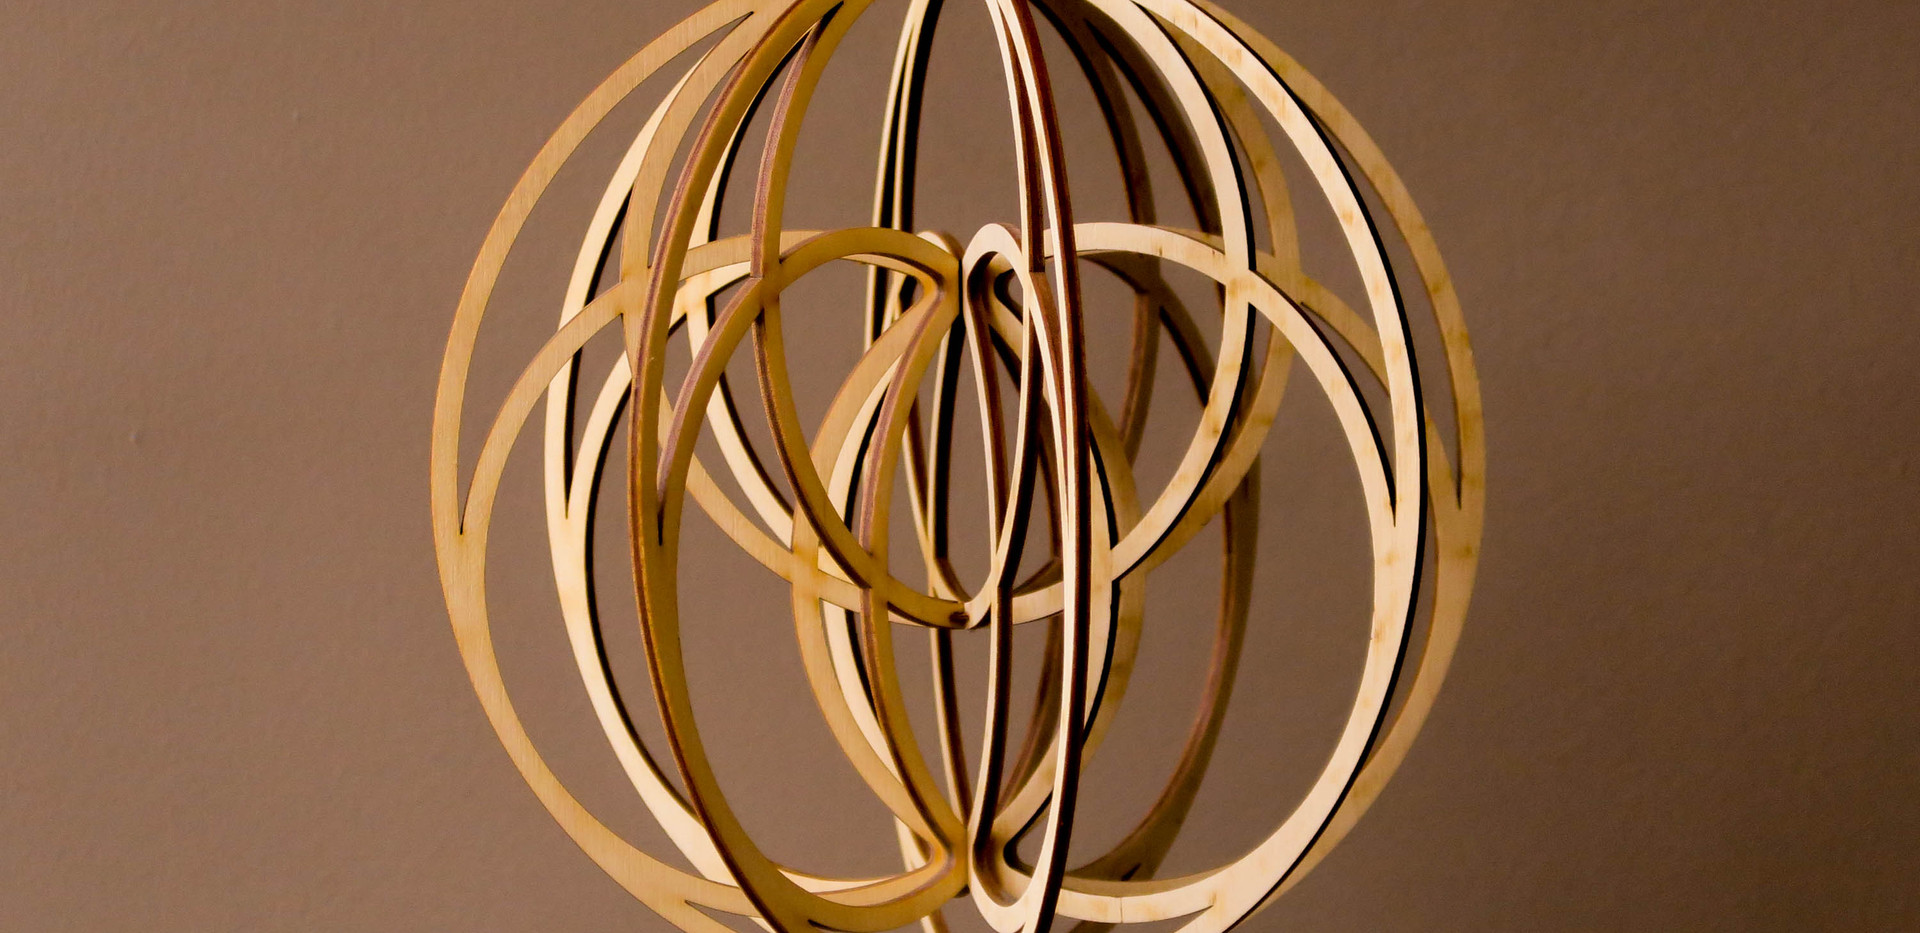 Circles in Circles n2 - medium